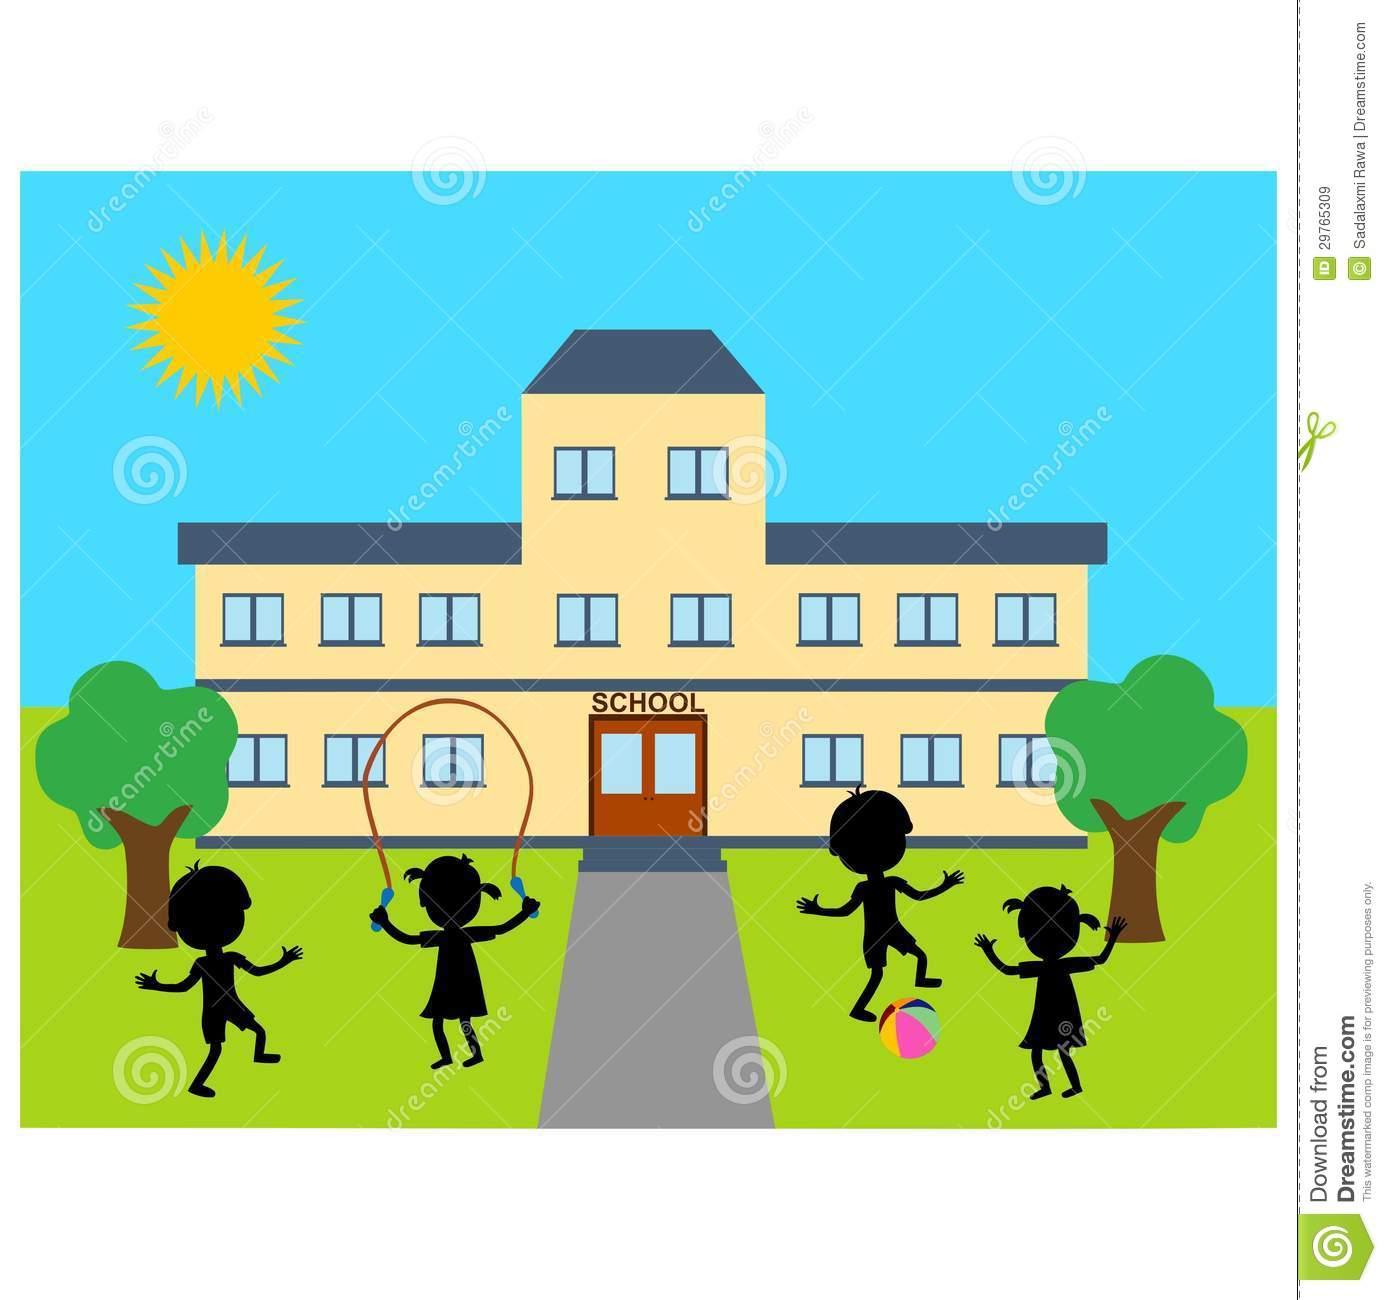 1387x1300 School Building Clipart